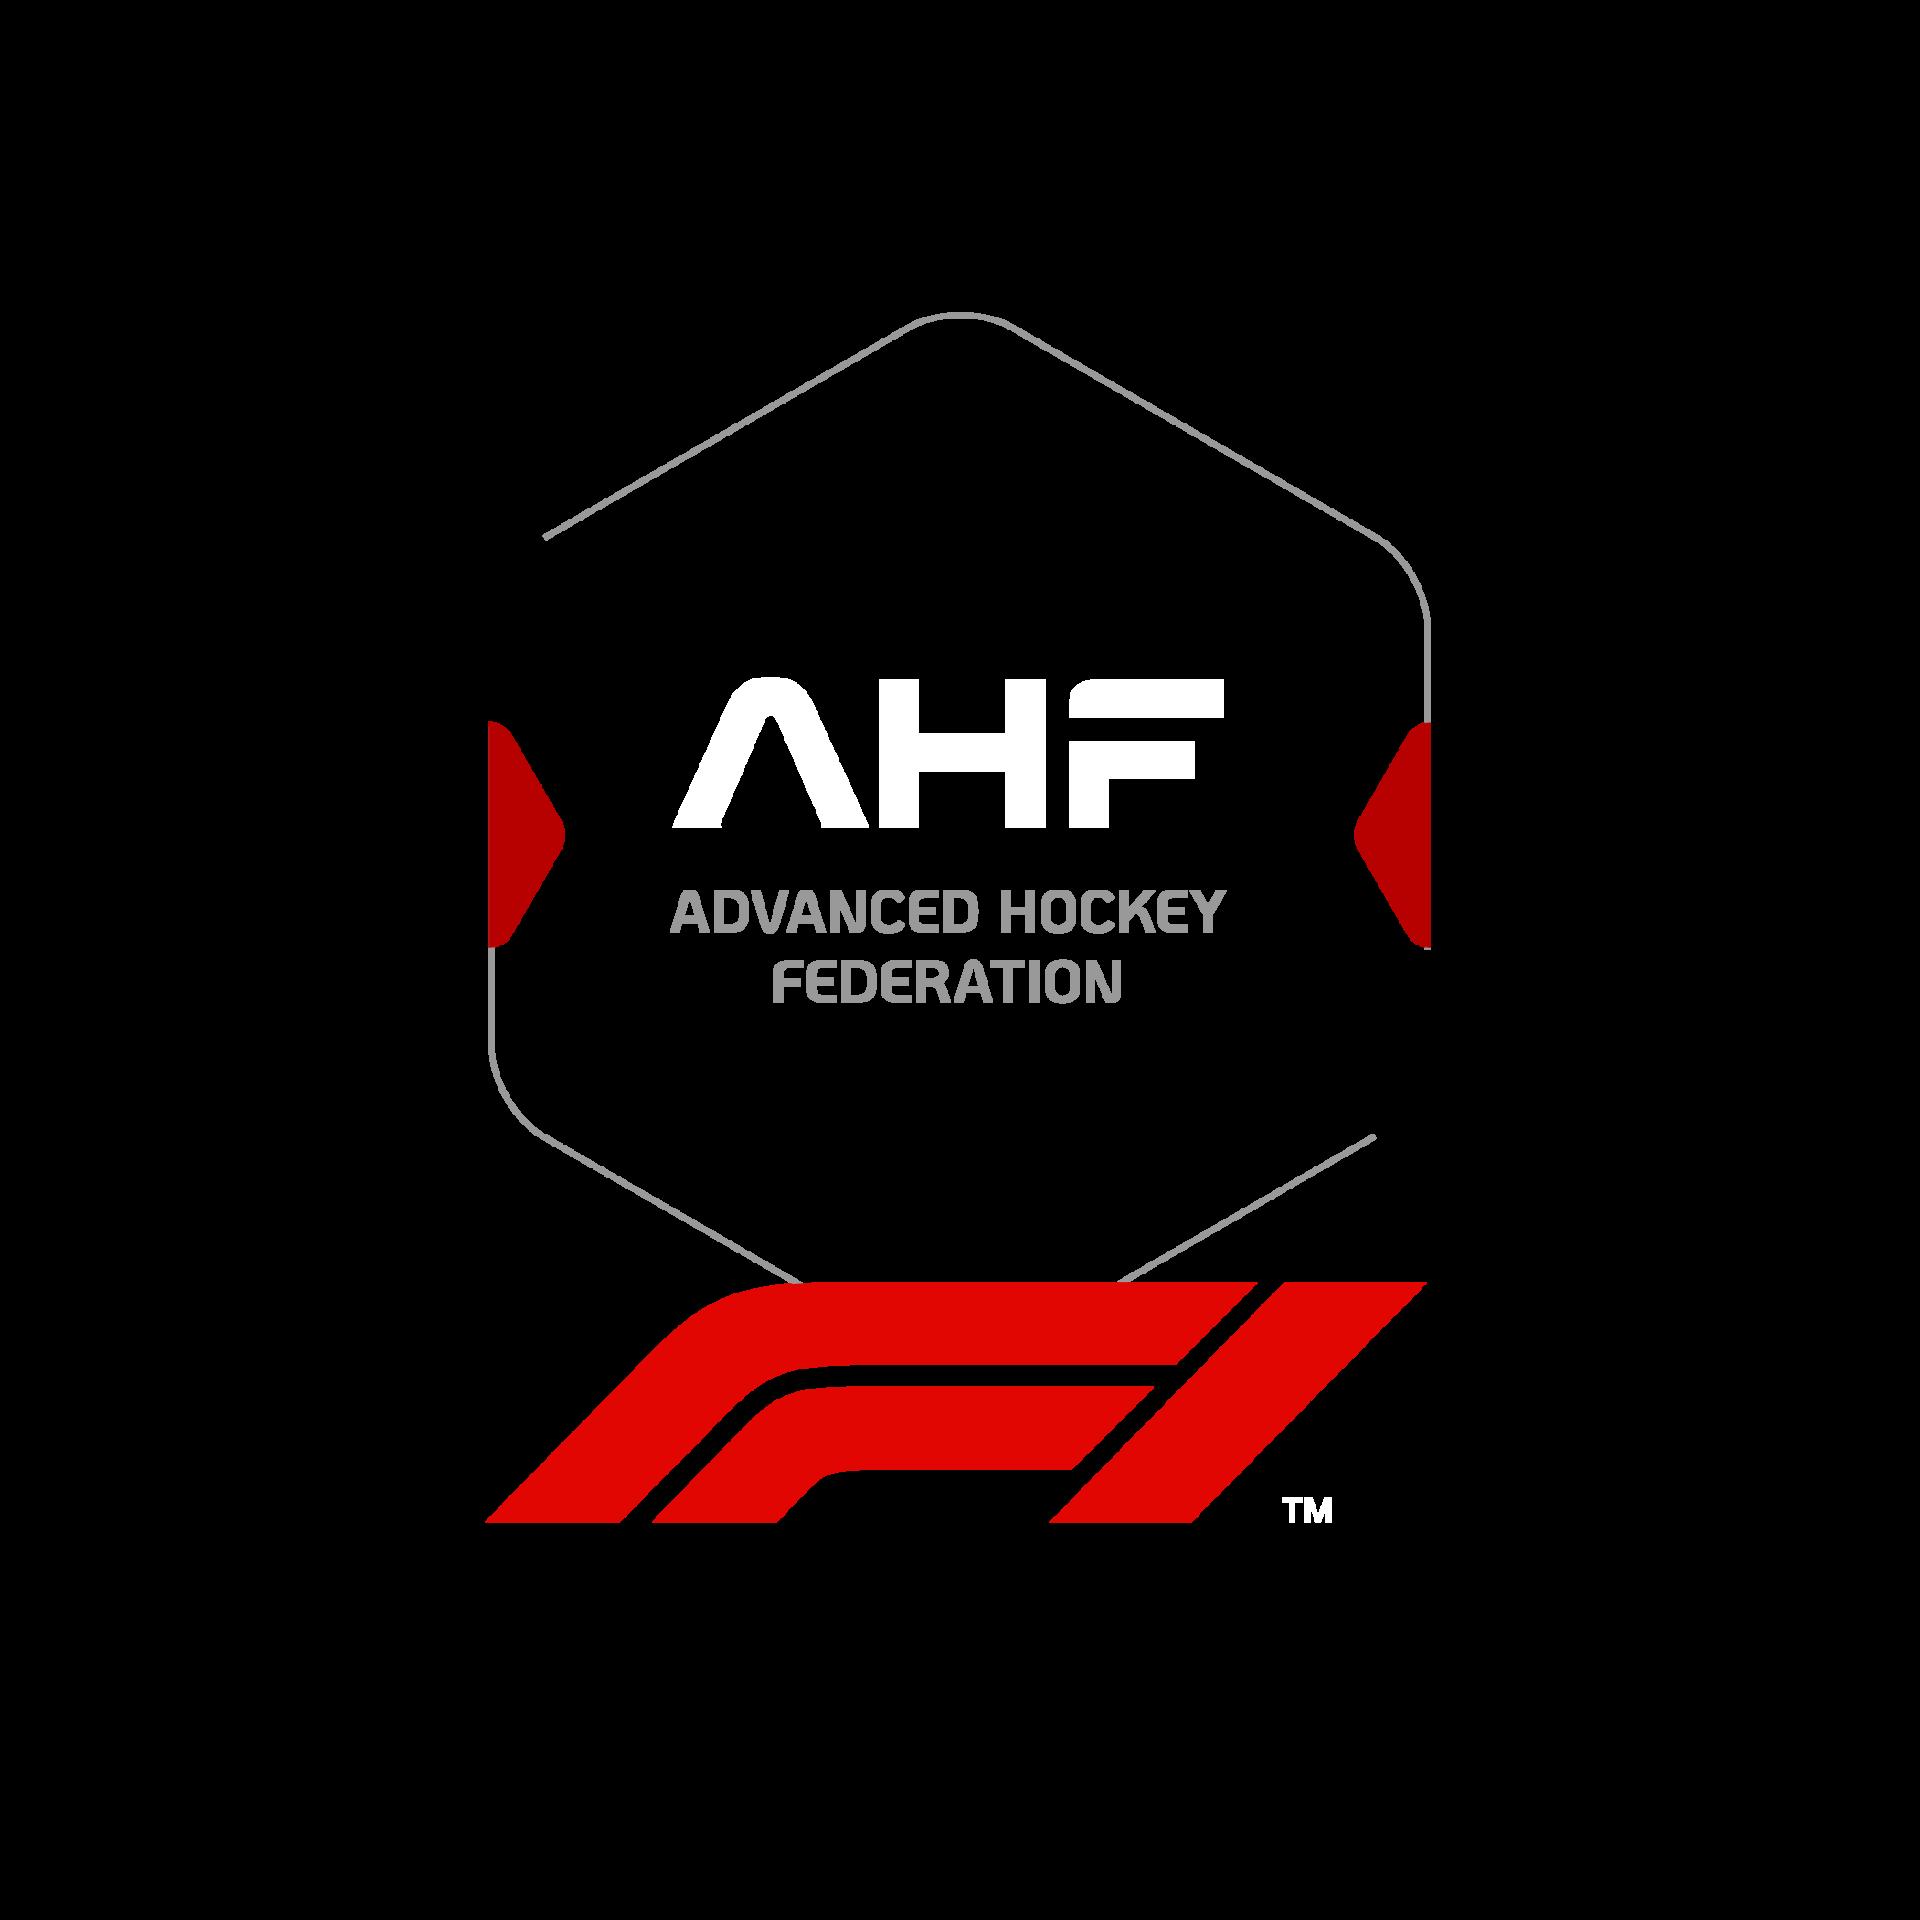 F1-AHF-HOCKEY